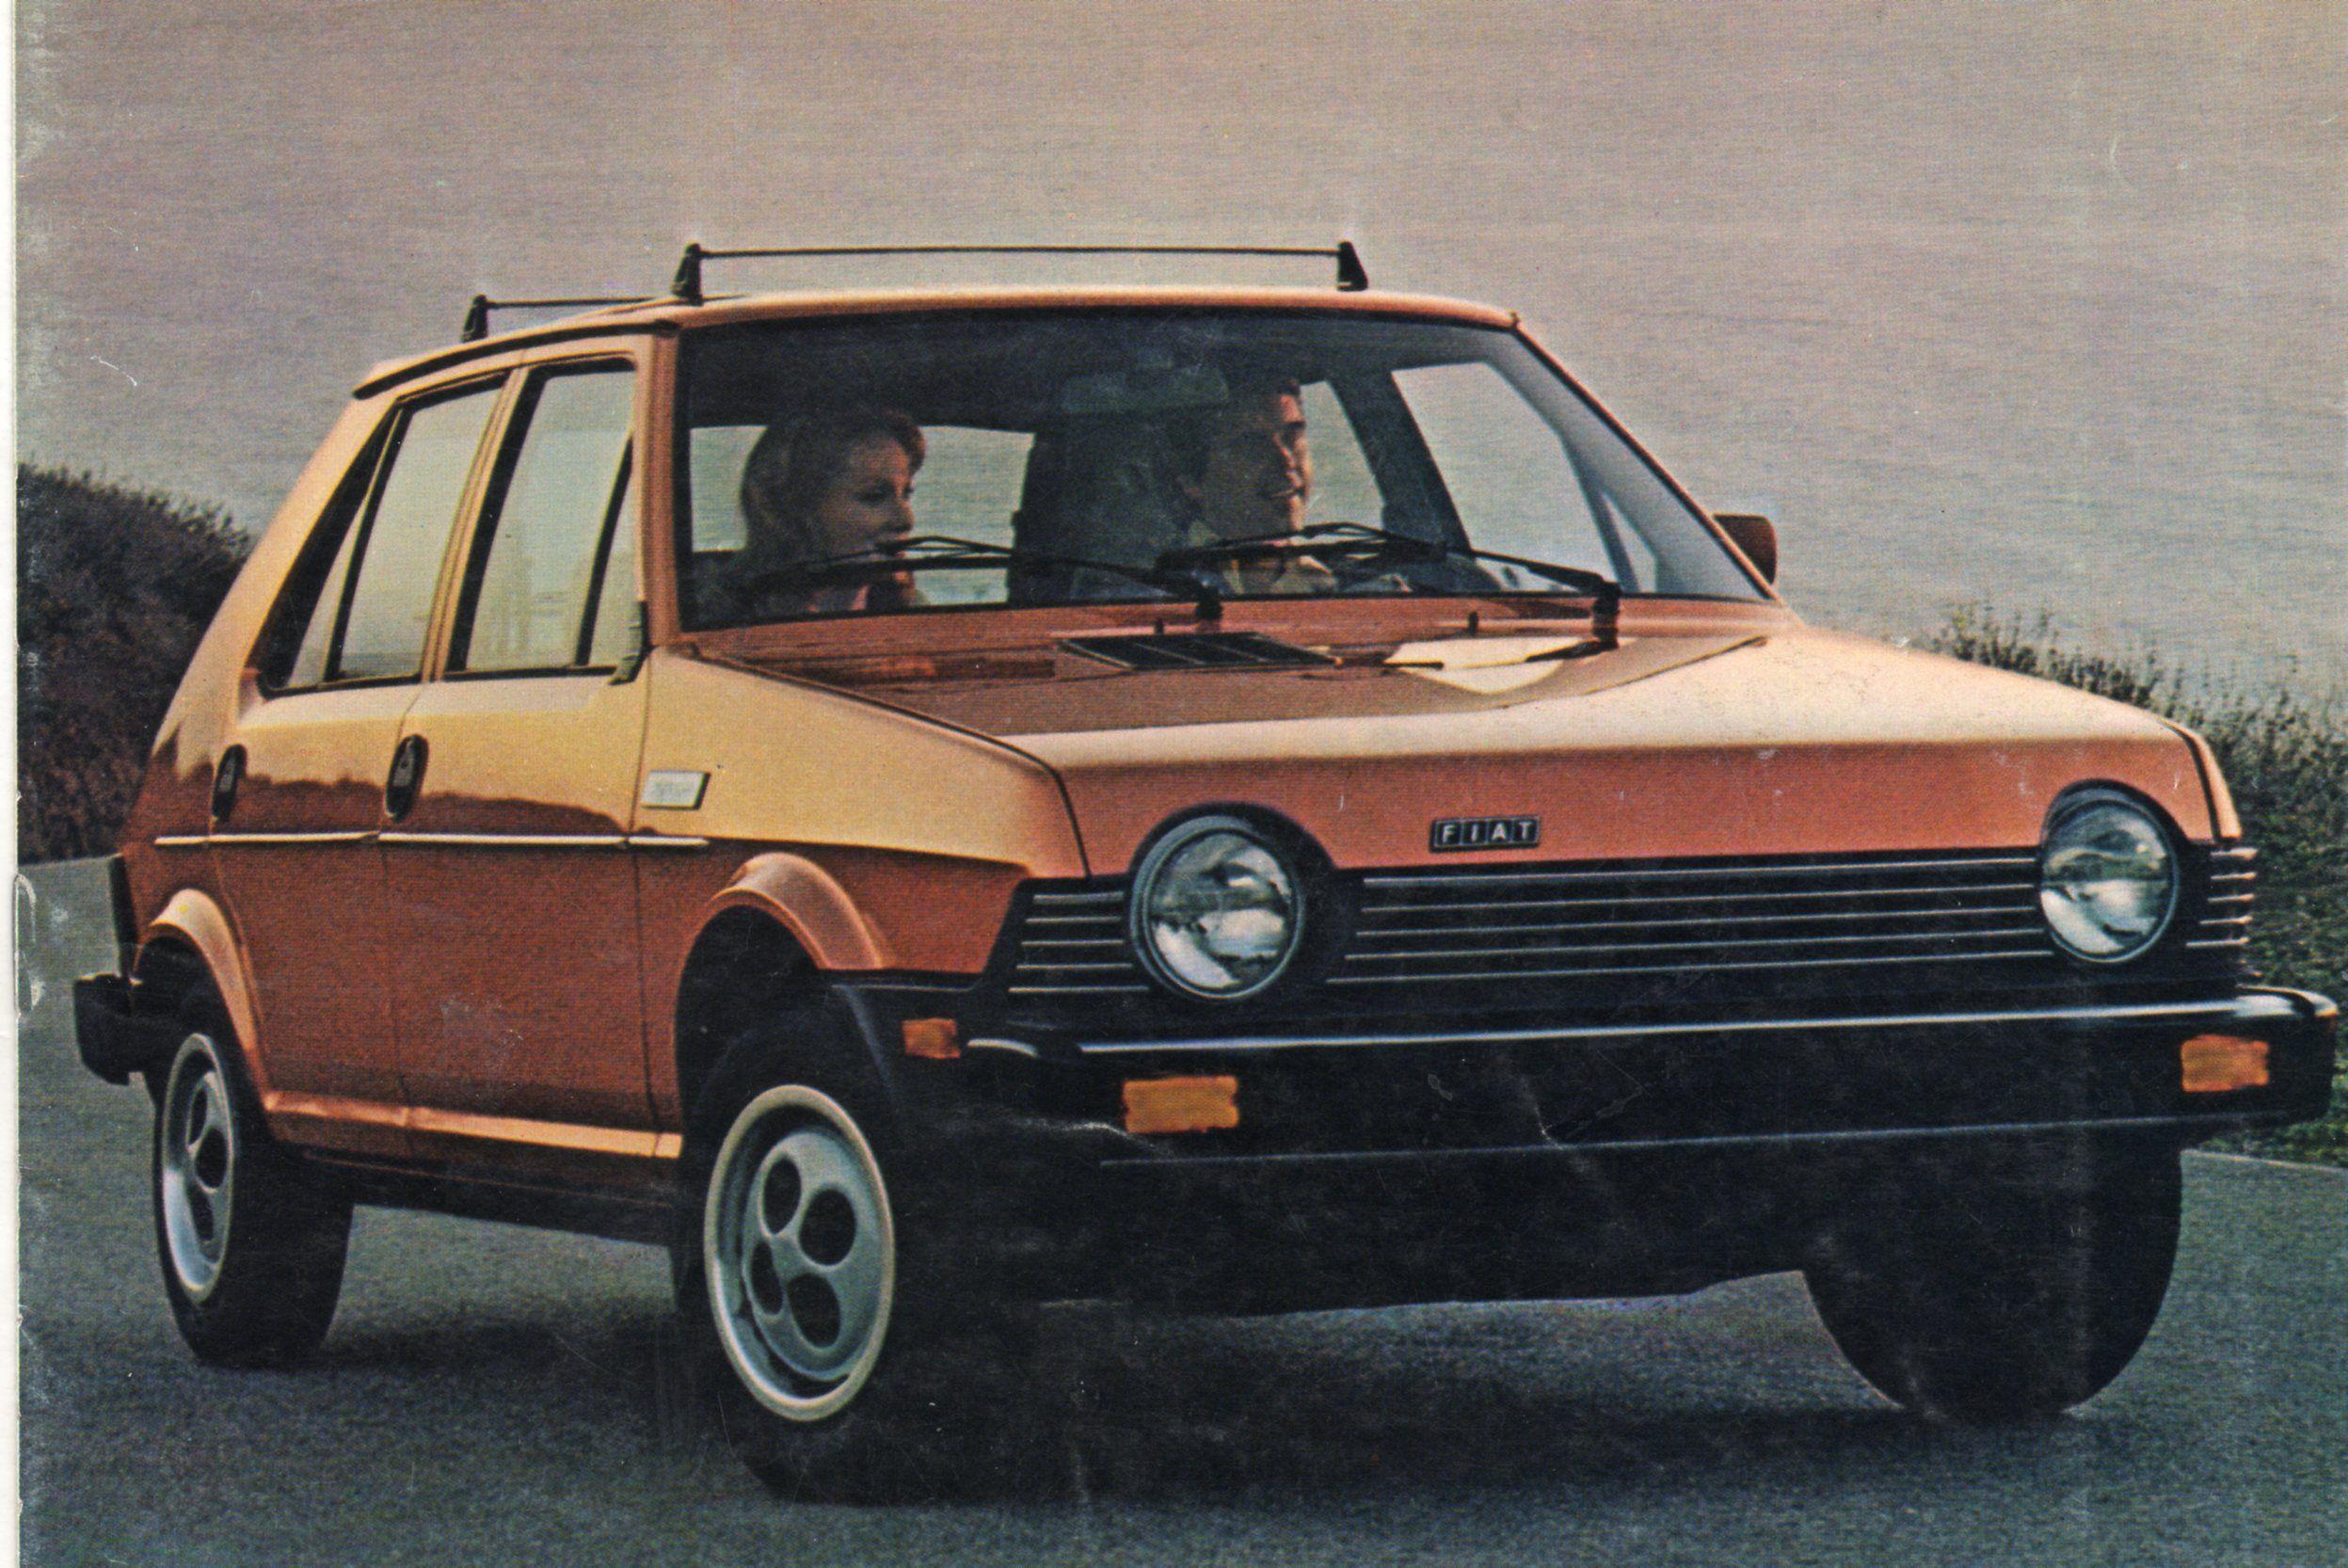 1979 fiat strada vehicles pinterest strada cars and. Black Bedroom Furniture Sets. Home Design Ideas